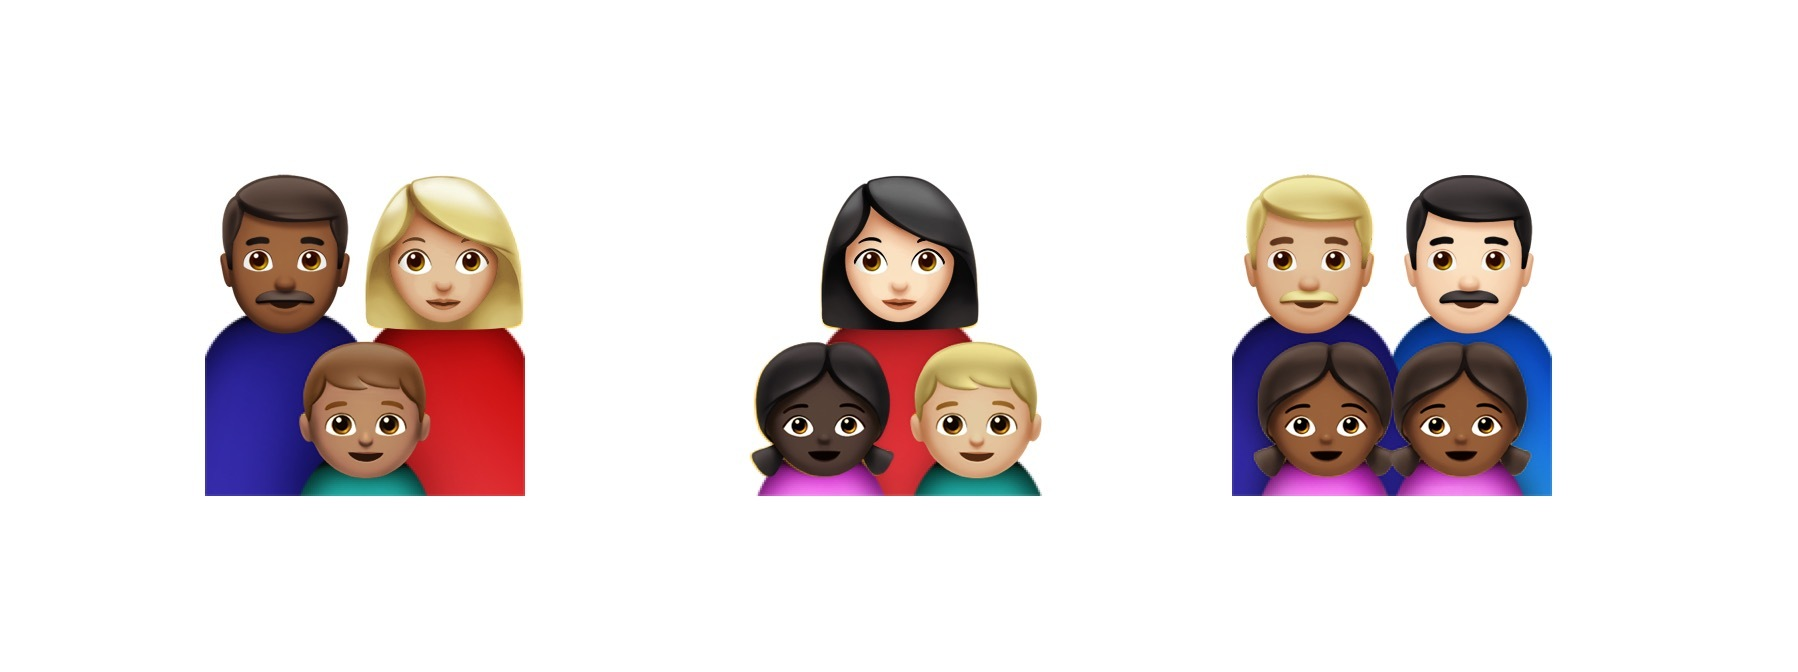 Emojis showing diverse family types by Emojipedia